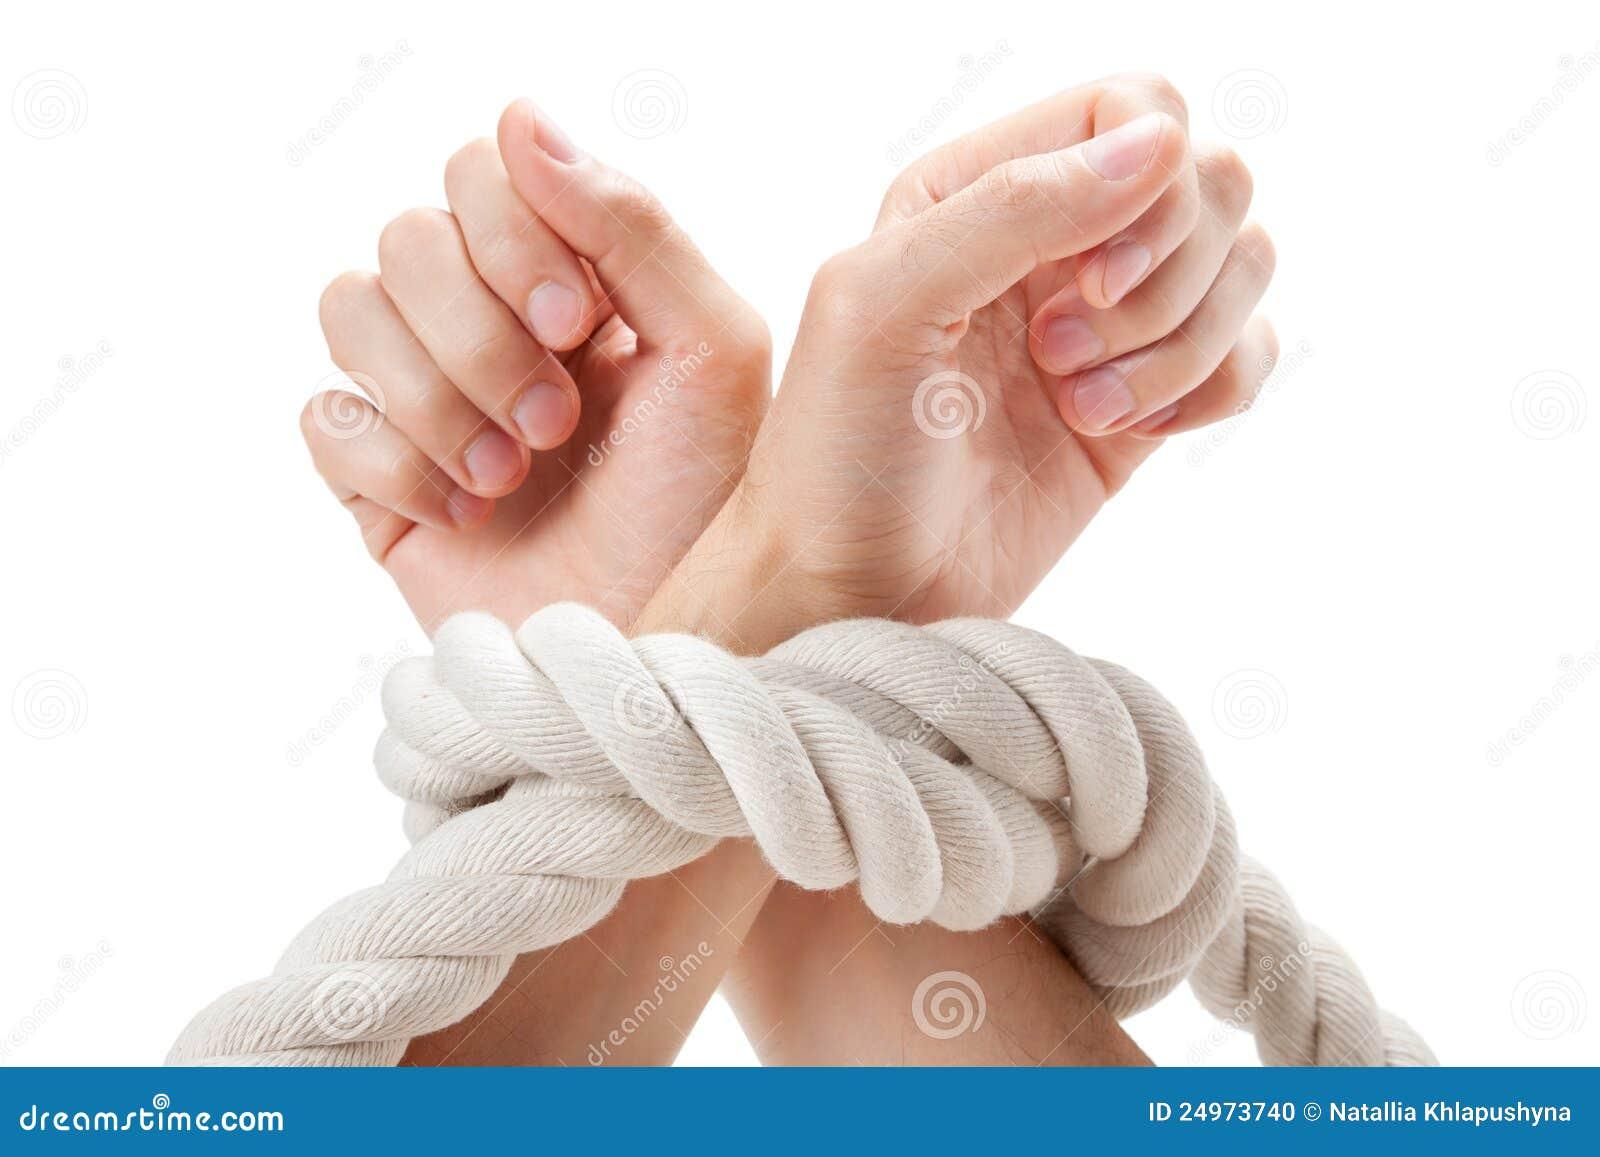 Связали руки онлайн 23 фотография